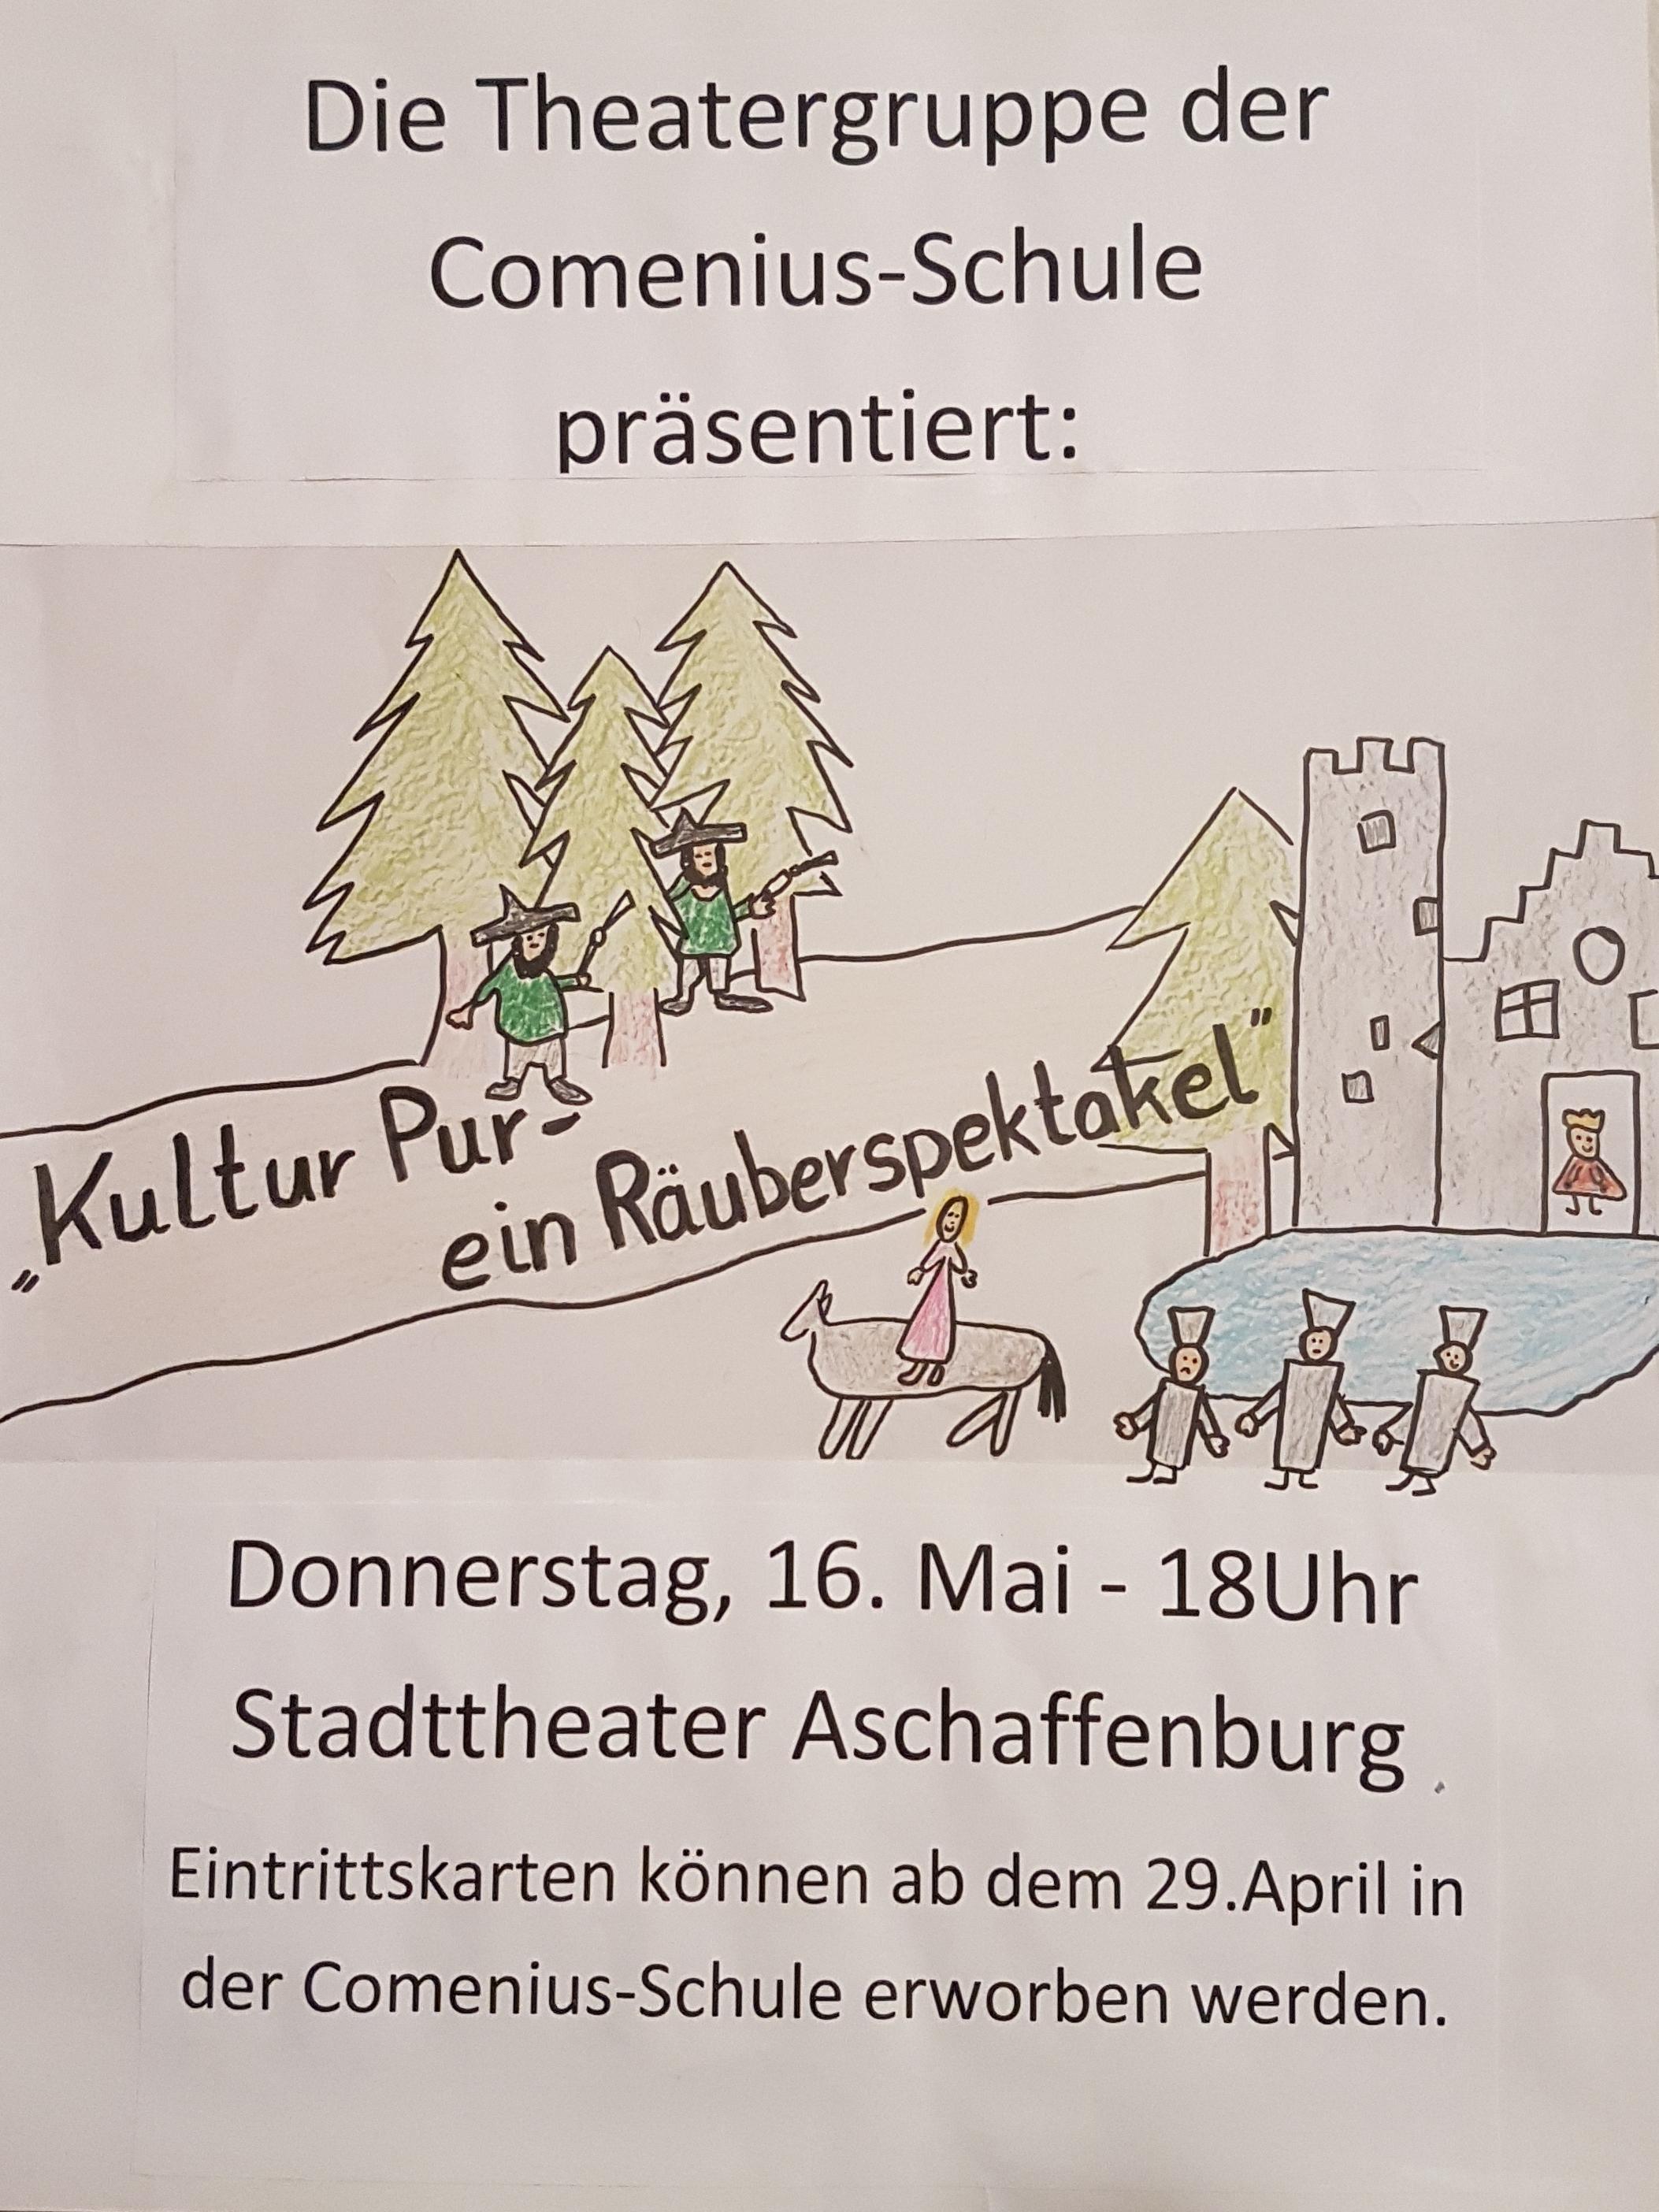 Theateraufführung der Theater-AG der Comenius-Schule im Stadttheater @ Stadttheater Aschaffenburg